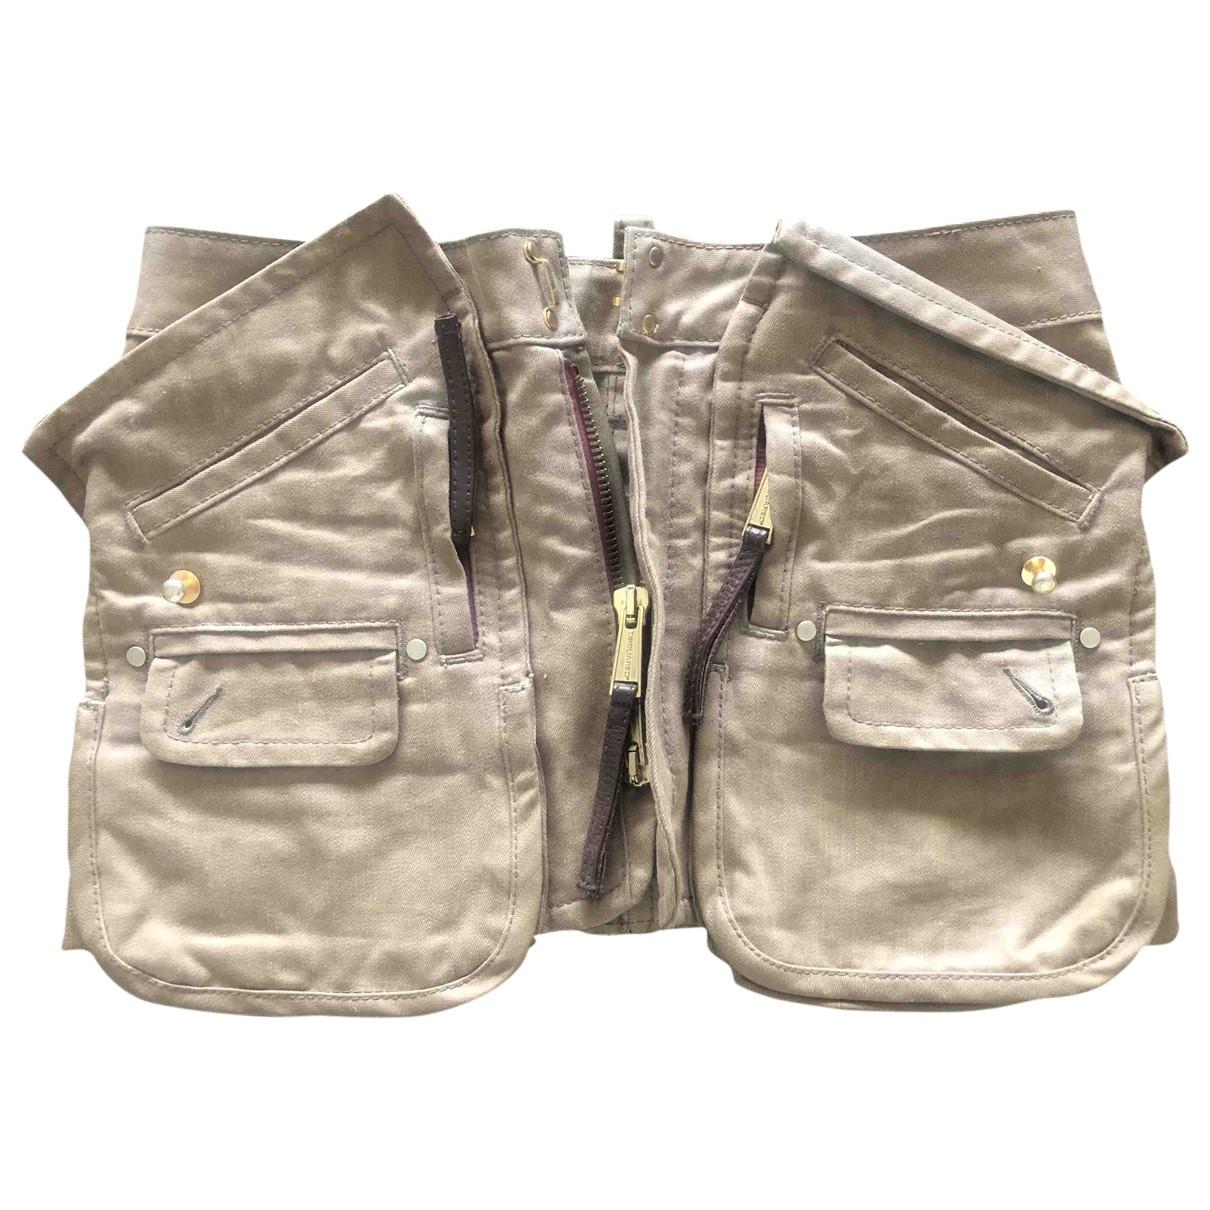 Dsquared2 \N Camel Cotton skirt for Women 38 IT